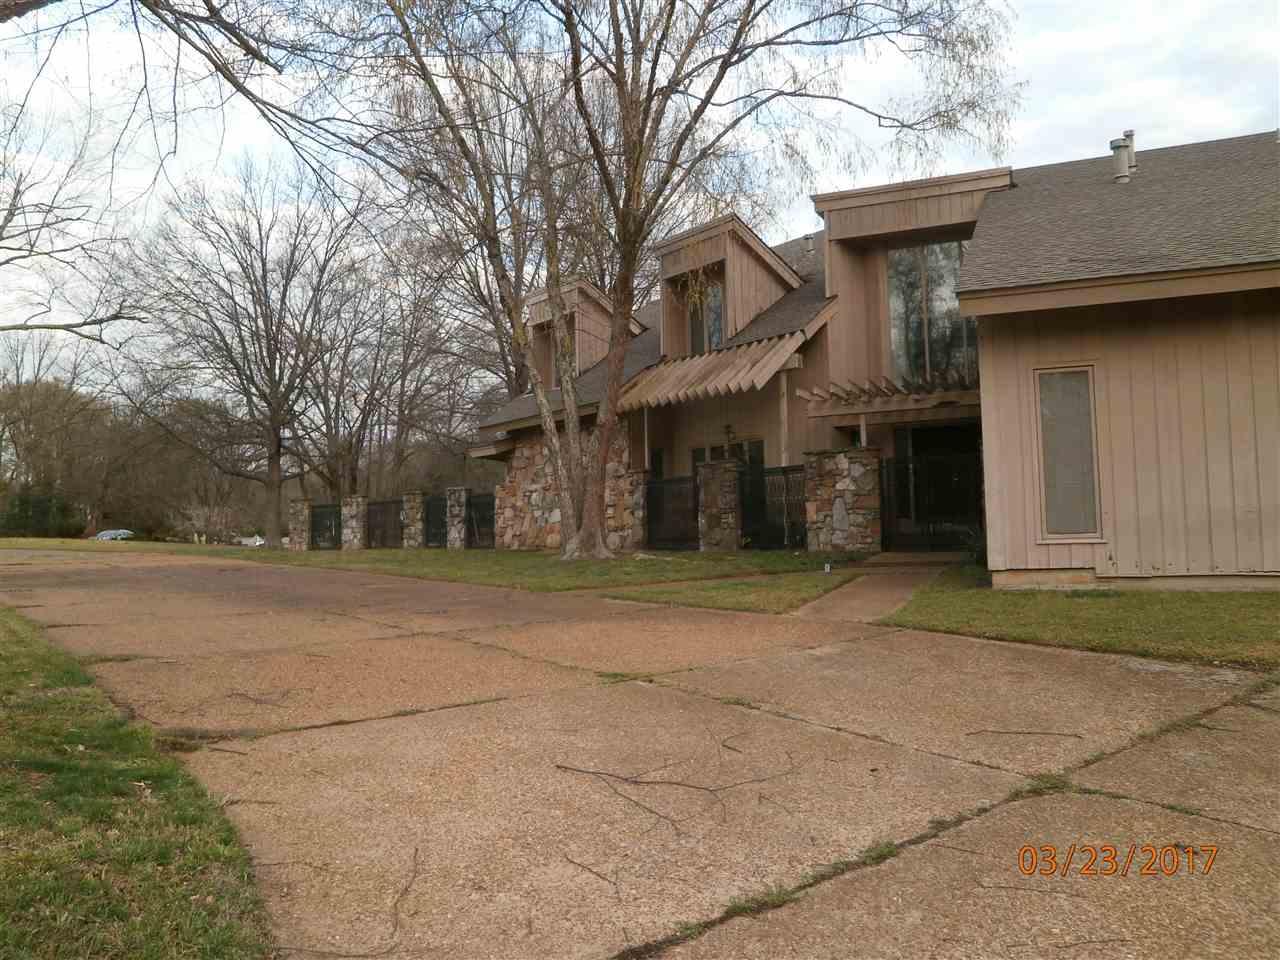 6564 Cottingham Memphis, TN 38120 - MLS #: 9998728